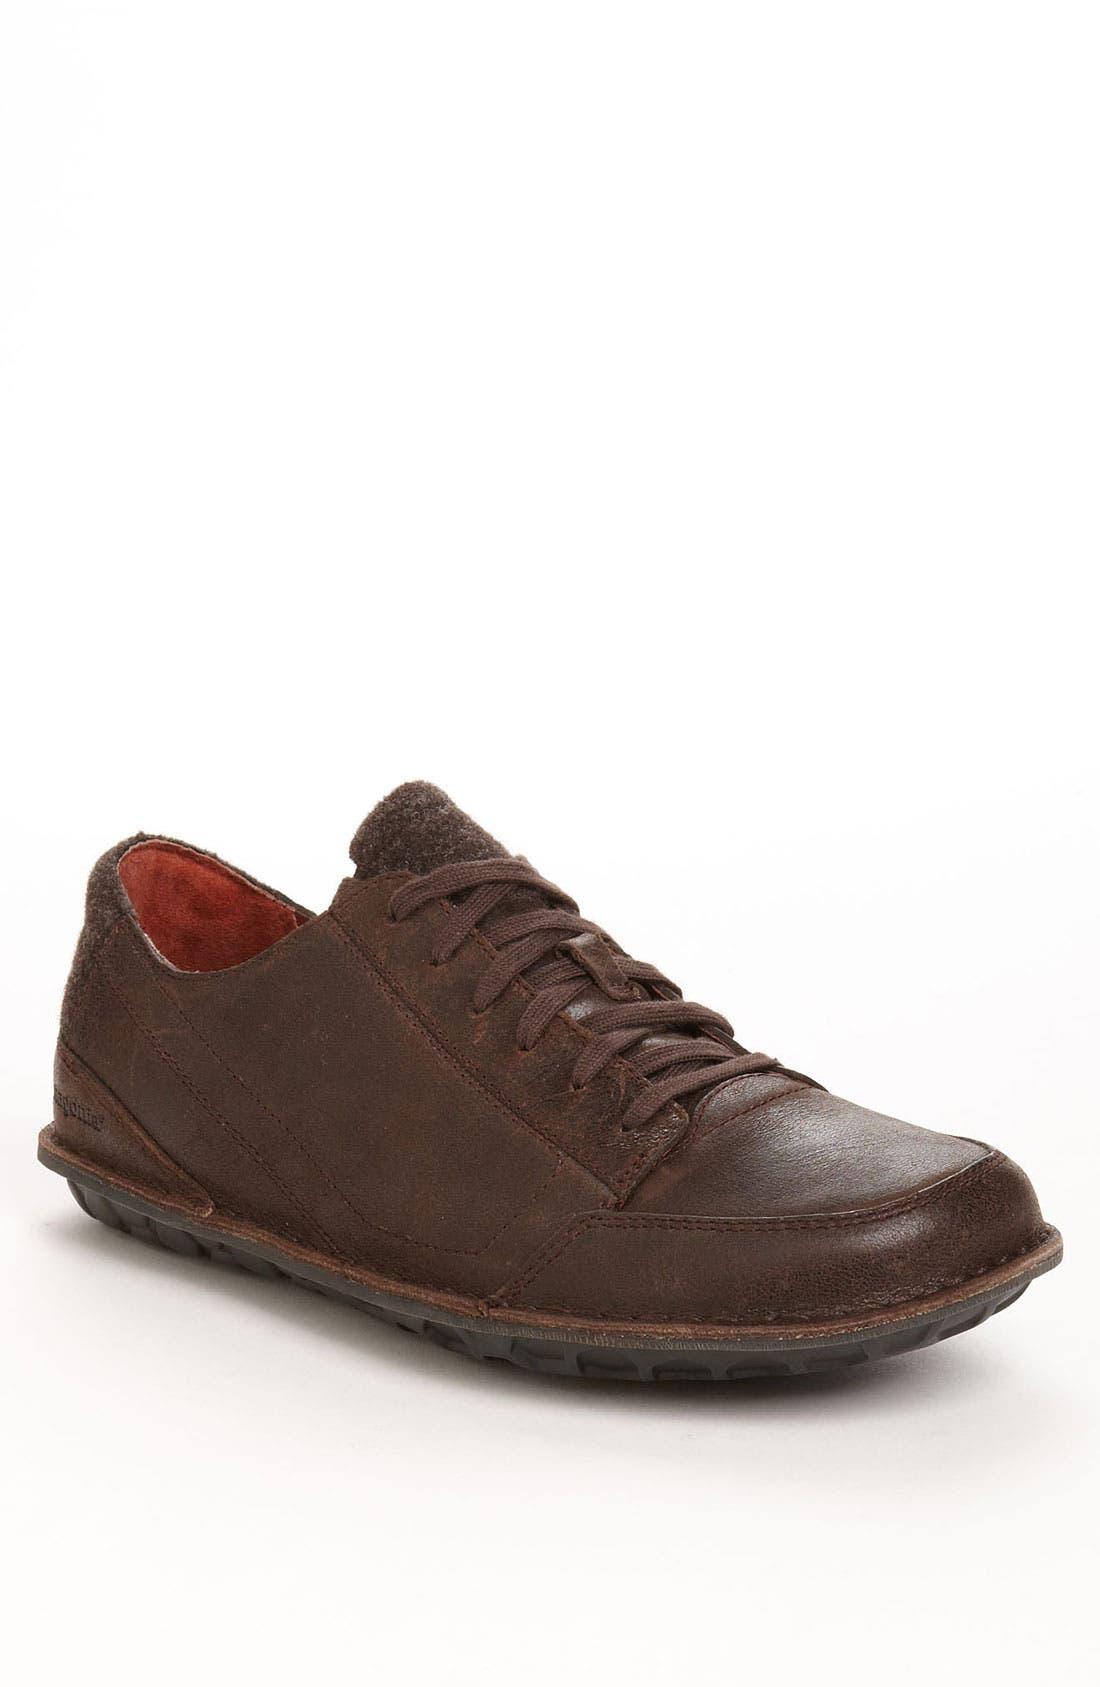 Alternate Image 1 Selected - Patagonia 'Banyan' Sneaker (Online Only)